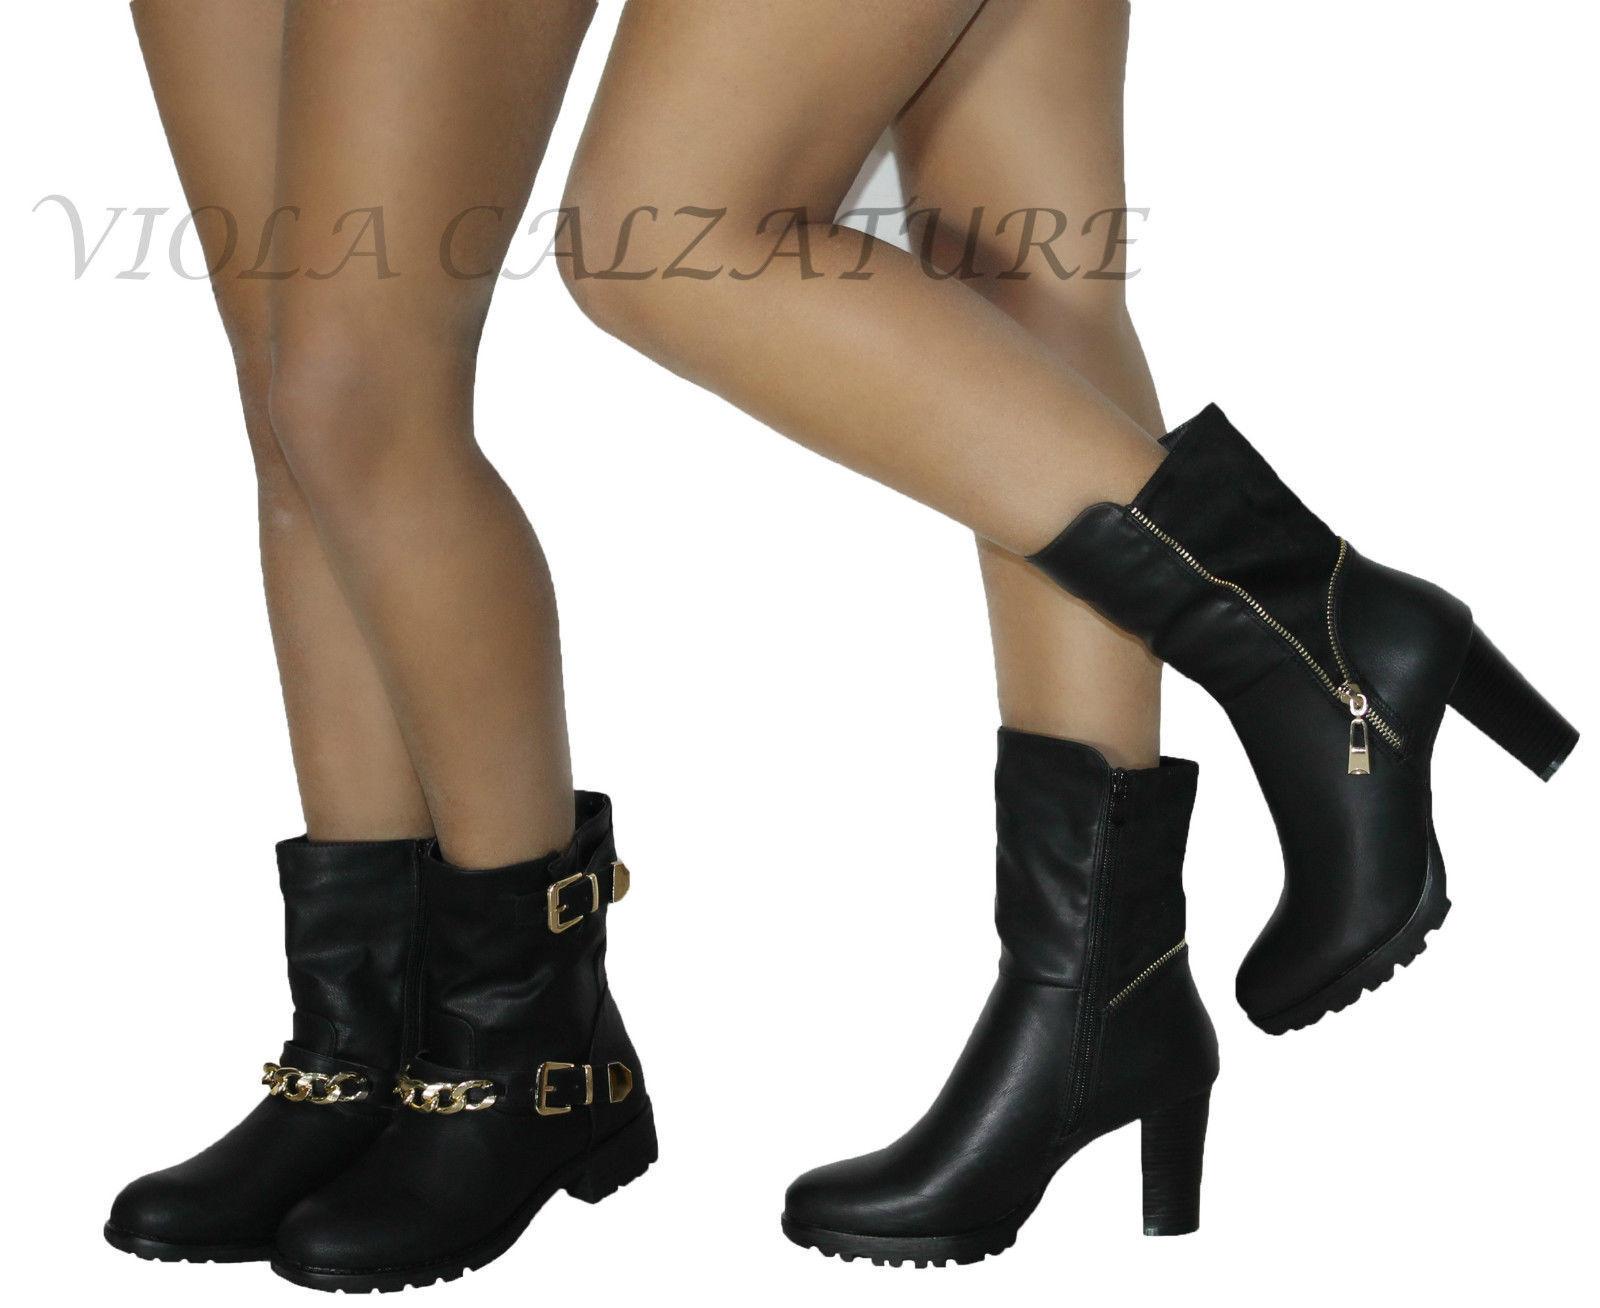 Stivali Donna Stivaletti Eleganti Biker Boots Catena cinturino n° 38 39 40